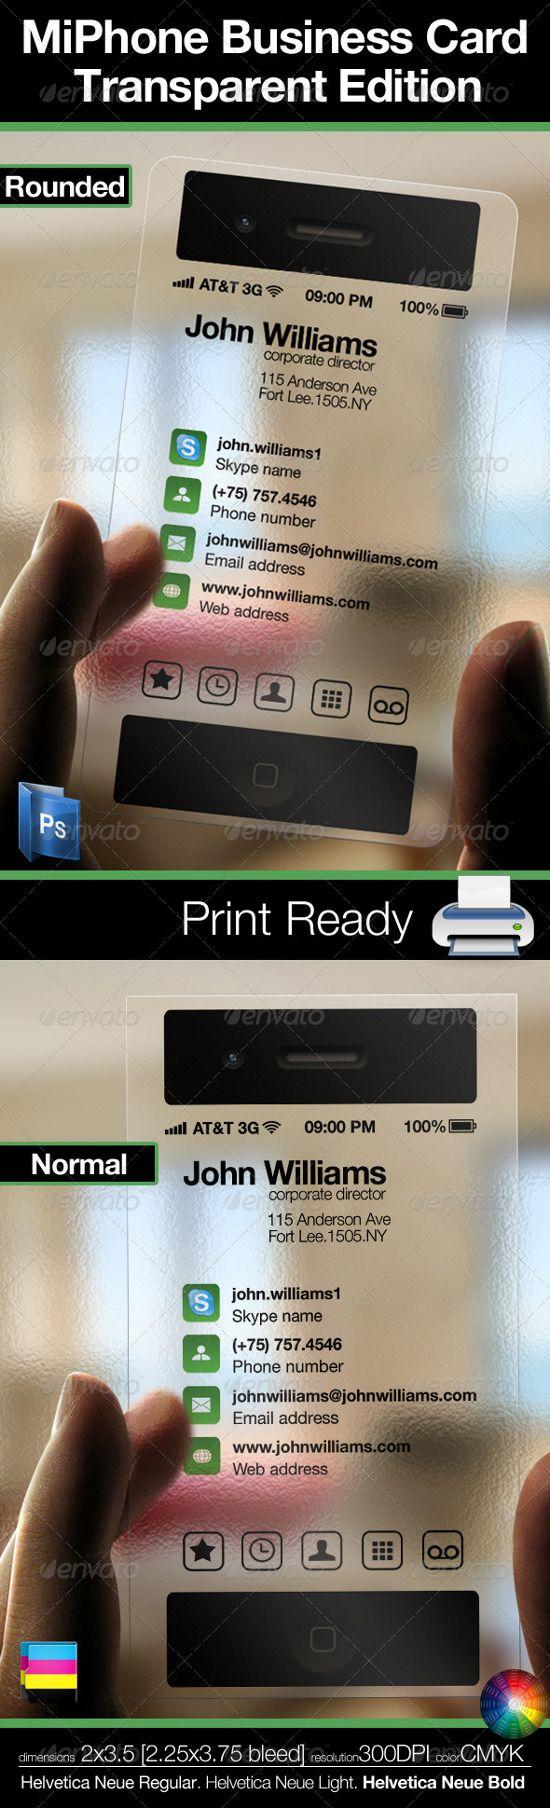 MiPhone Business Card Transparent Edition